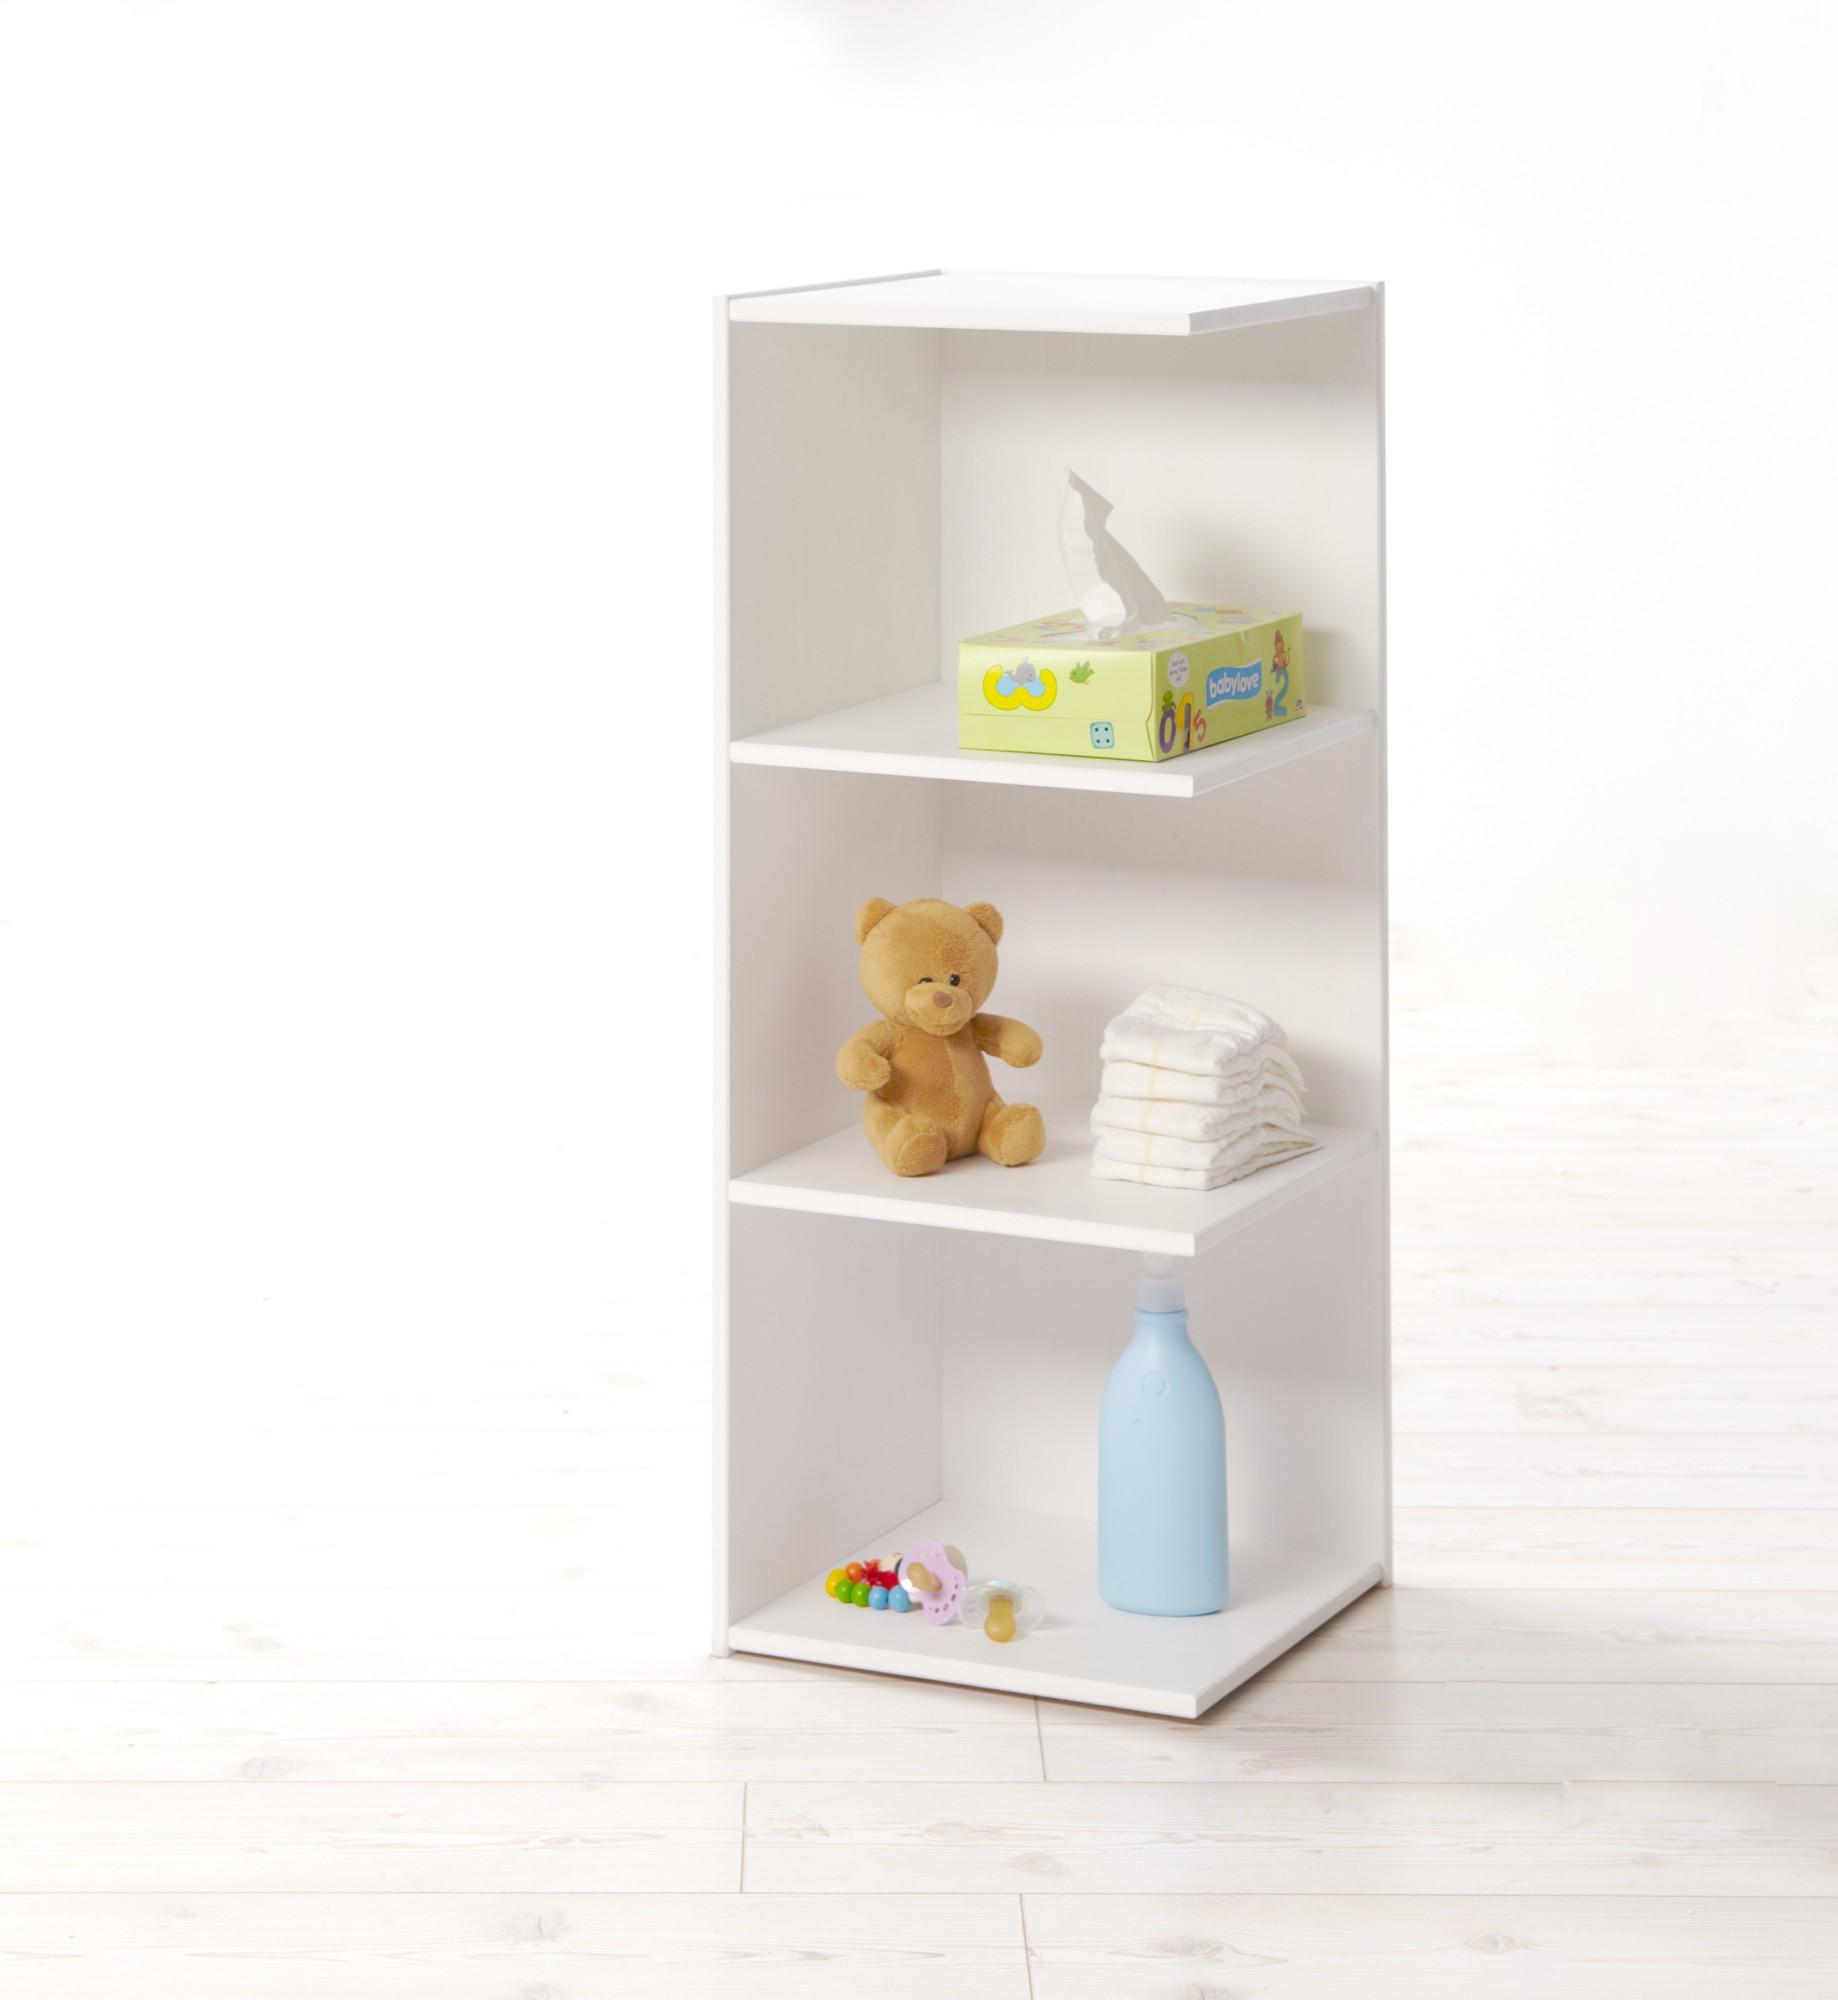 anstellregal f r wickelkommoden kiefer weiss h c m bel. Black Bedroom Furniture Sets. Home Design Ideas